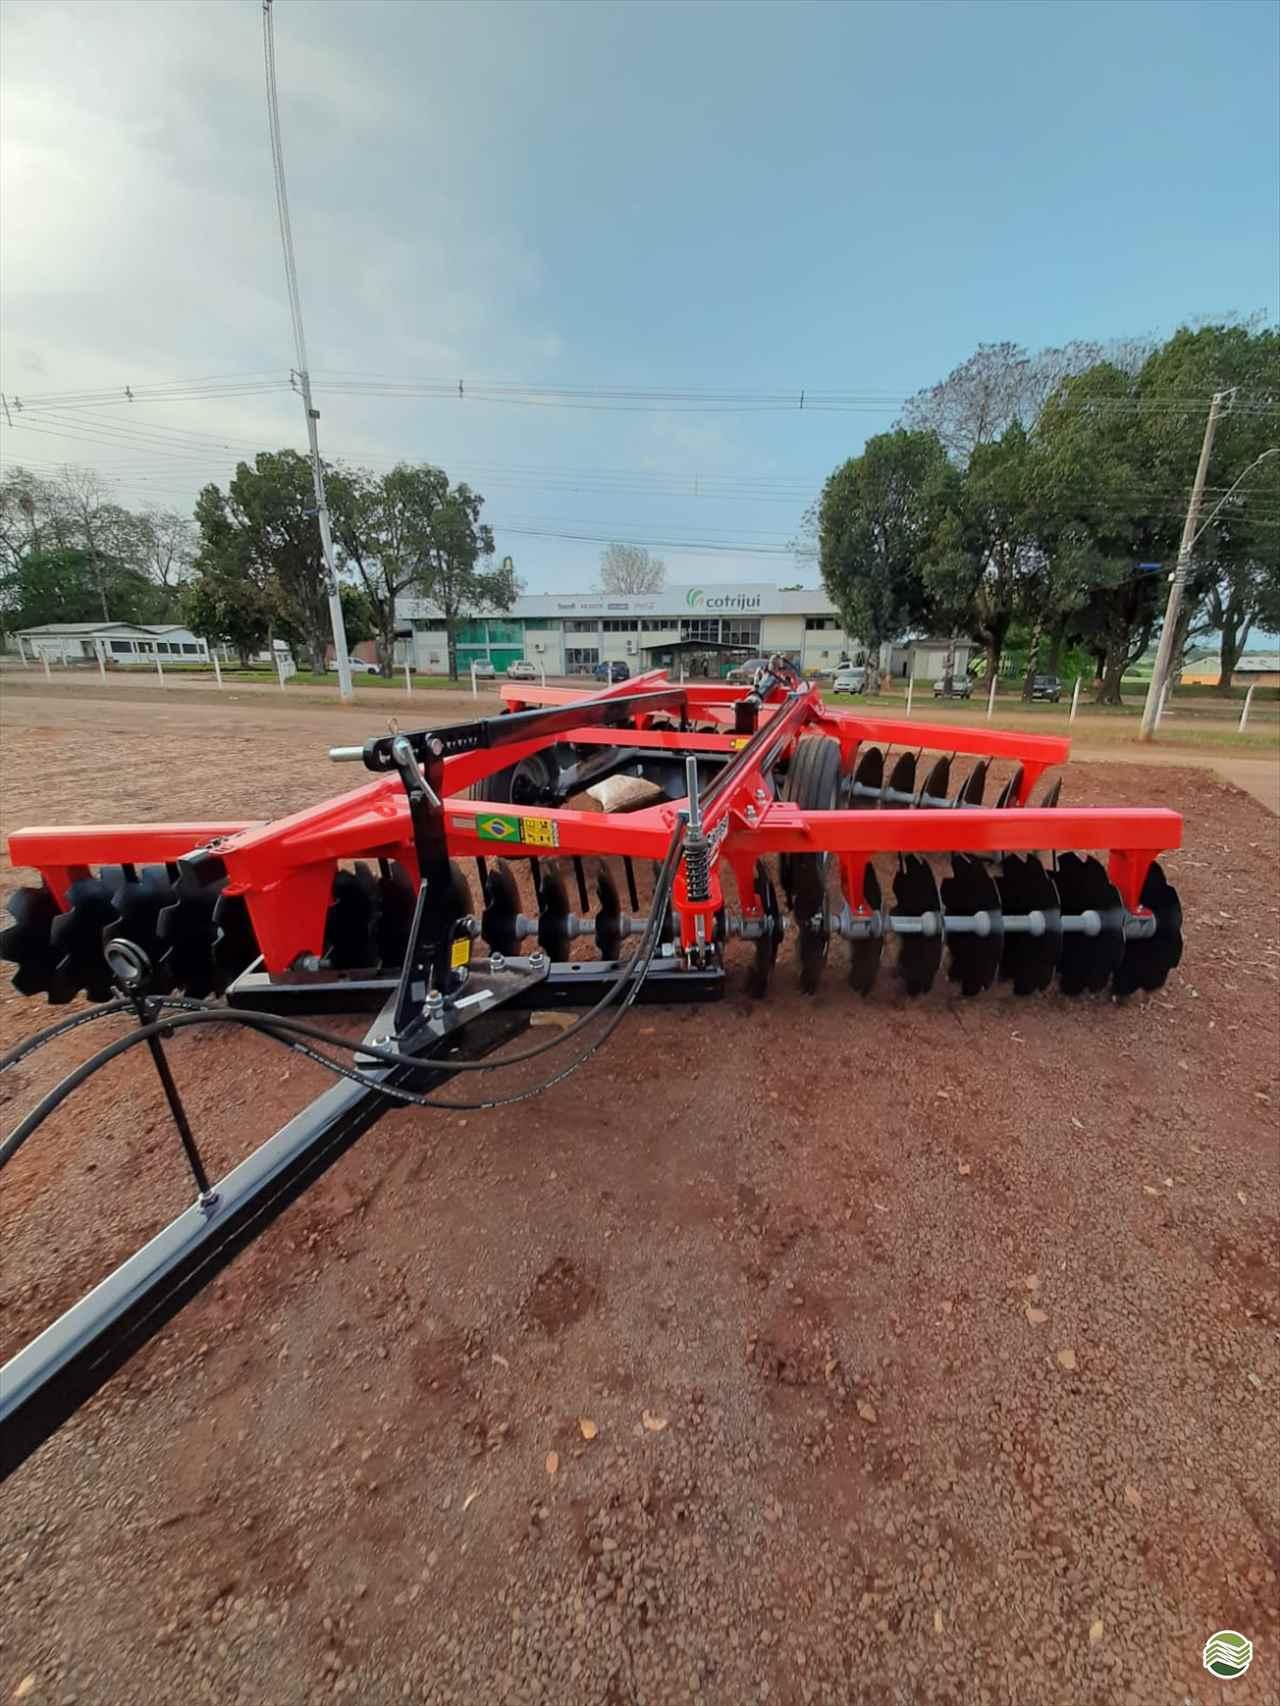 IMPLEMENTOS AGRICOLAS GRADE NIVELADORA NIVELADORA 44 DISCOS Agrocia Implementos Agricolas AJURICABA RIO GRANDE DO SUL RS